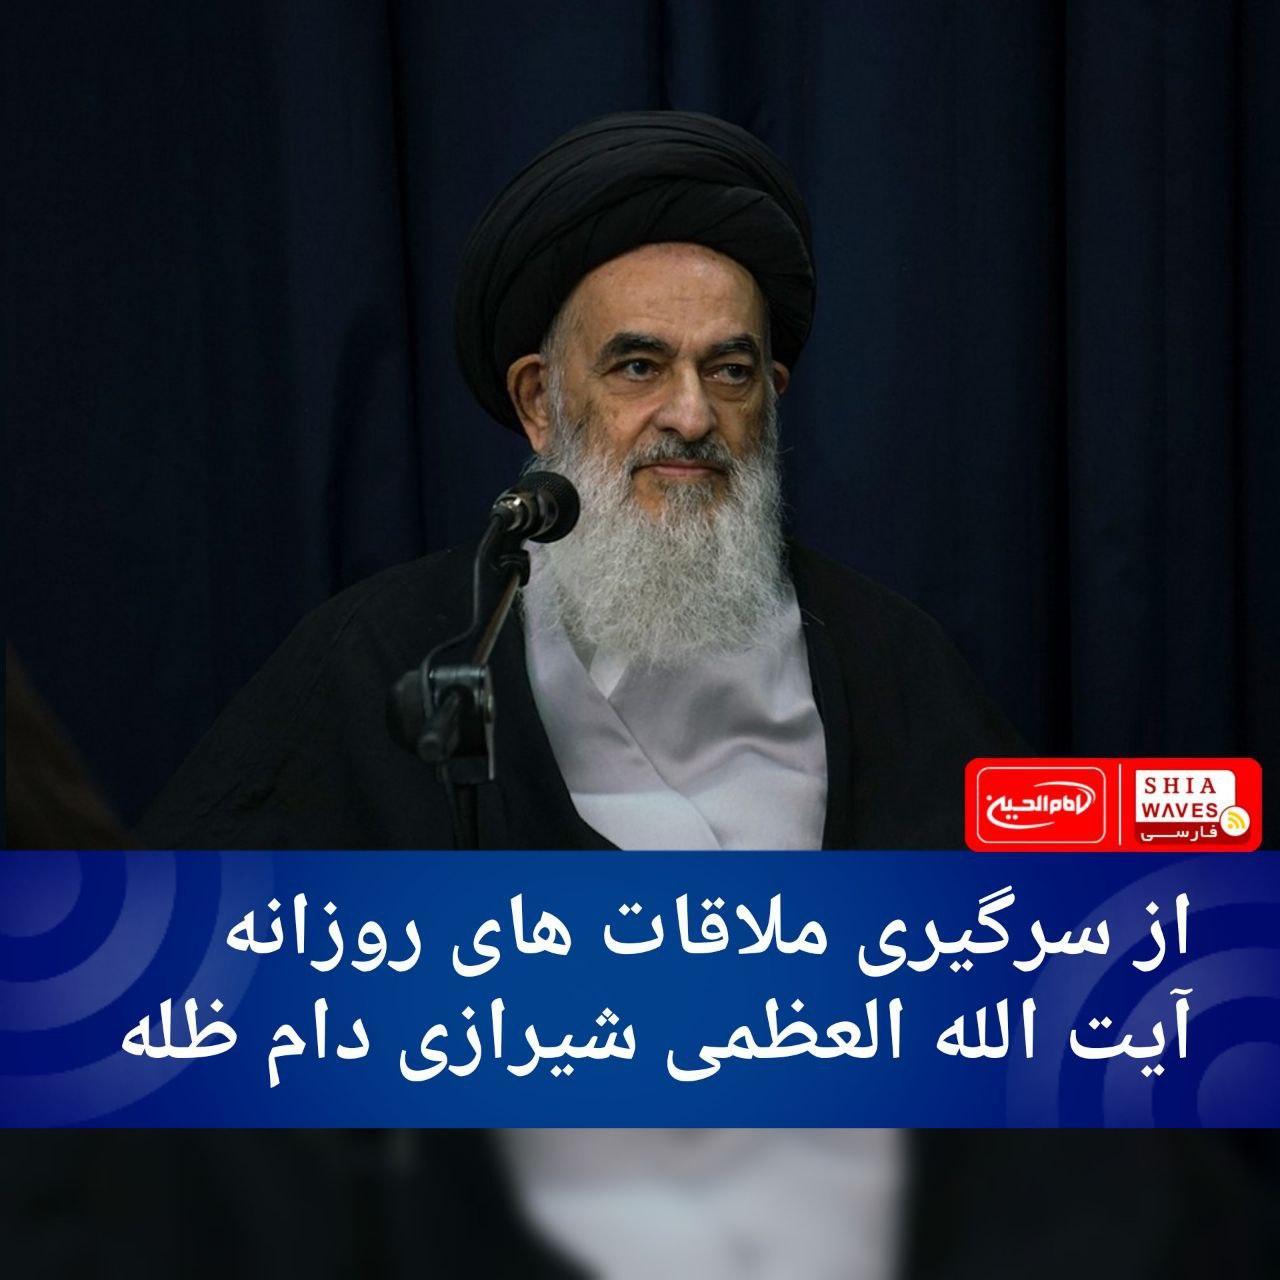 Photo of از سرگیری ملاقات های روزانه آیت الله العظمی شیرازی دام ظله